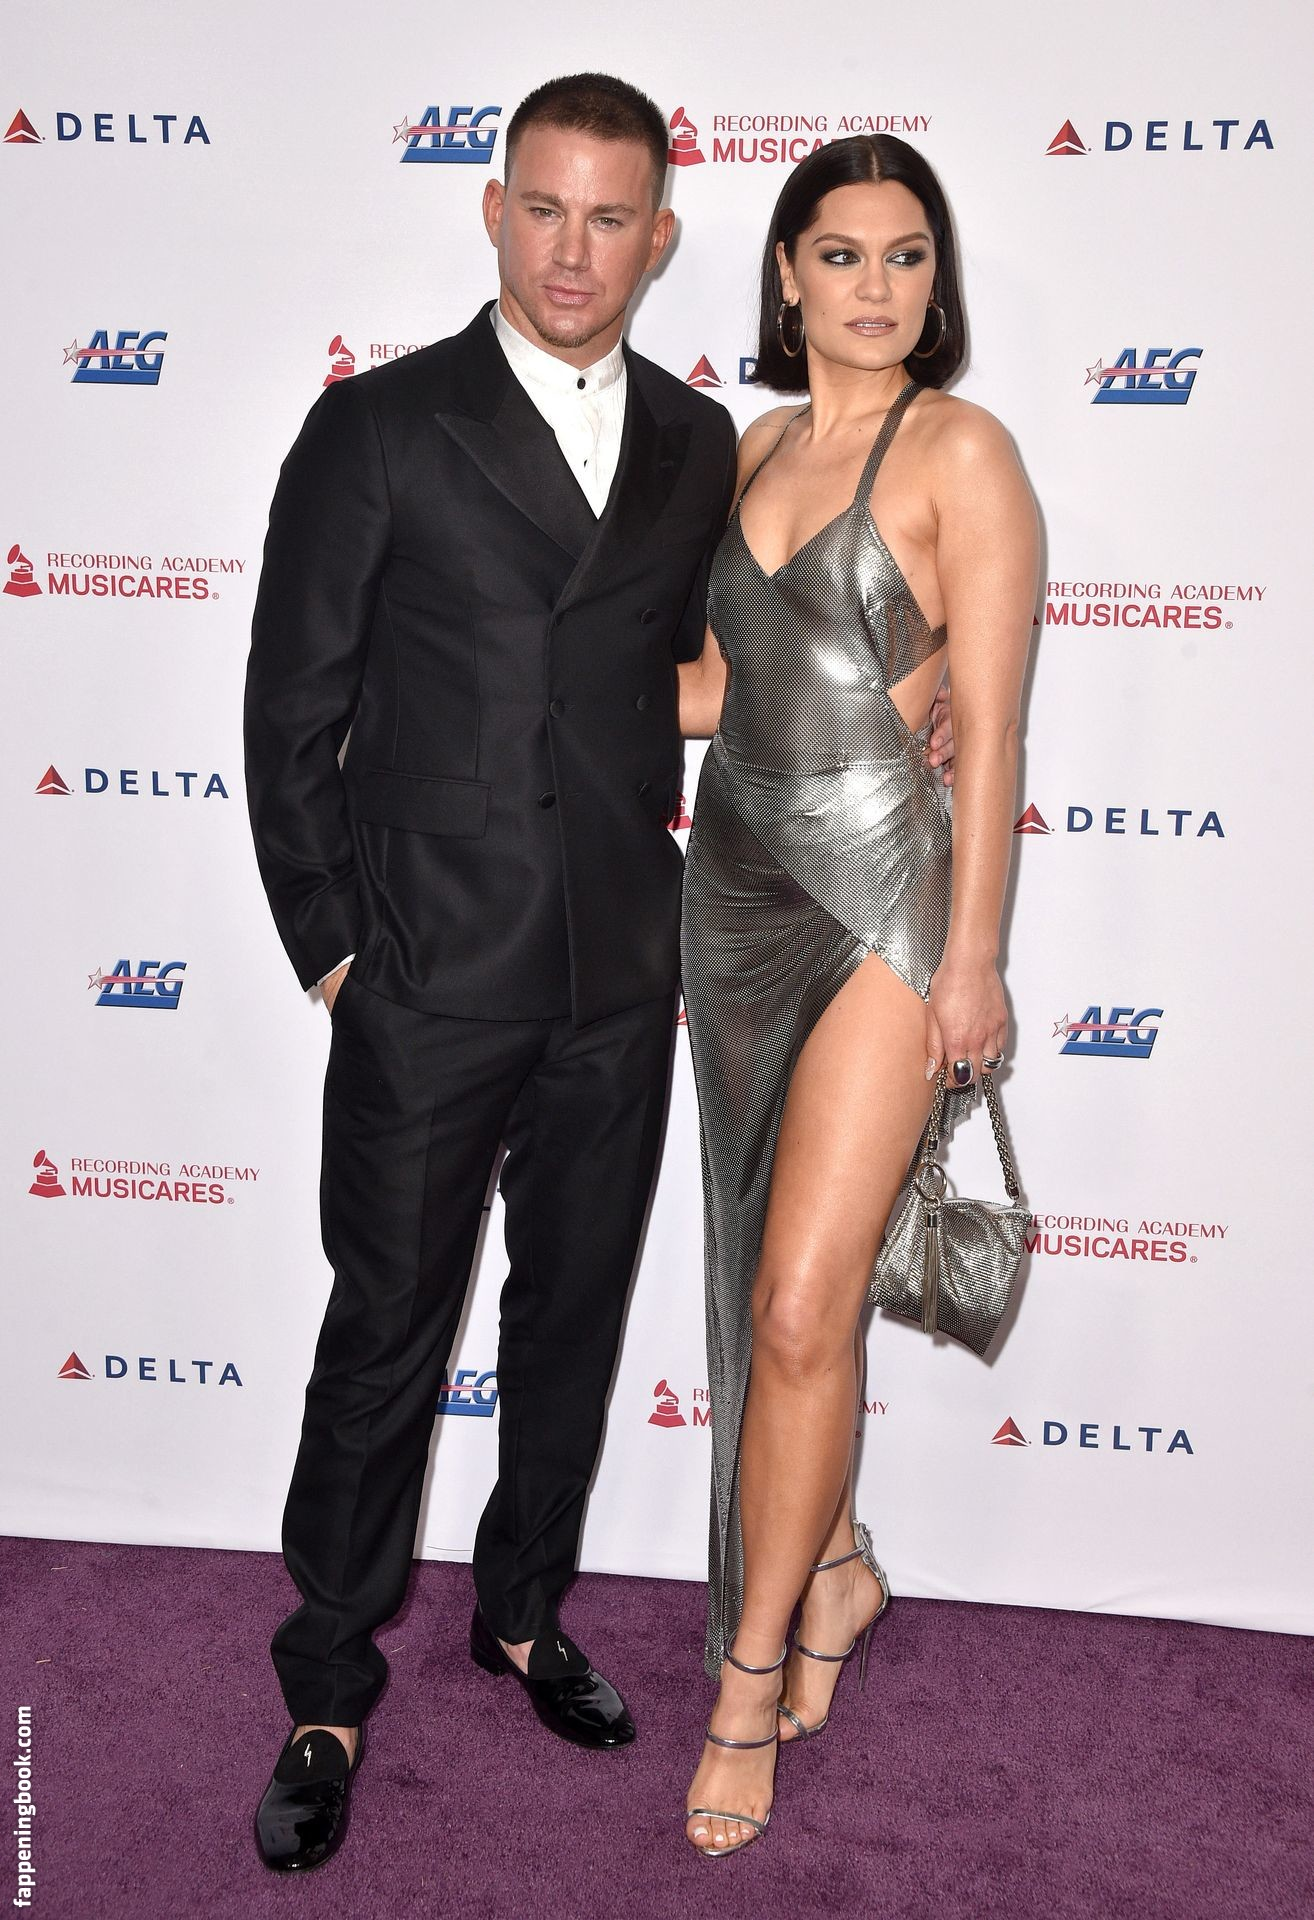 Jessie J Nude The Fappening - FappeningGram